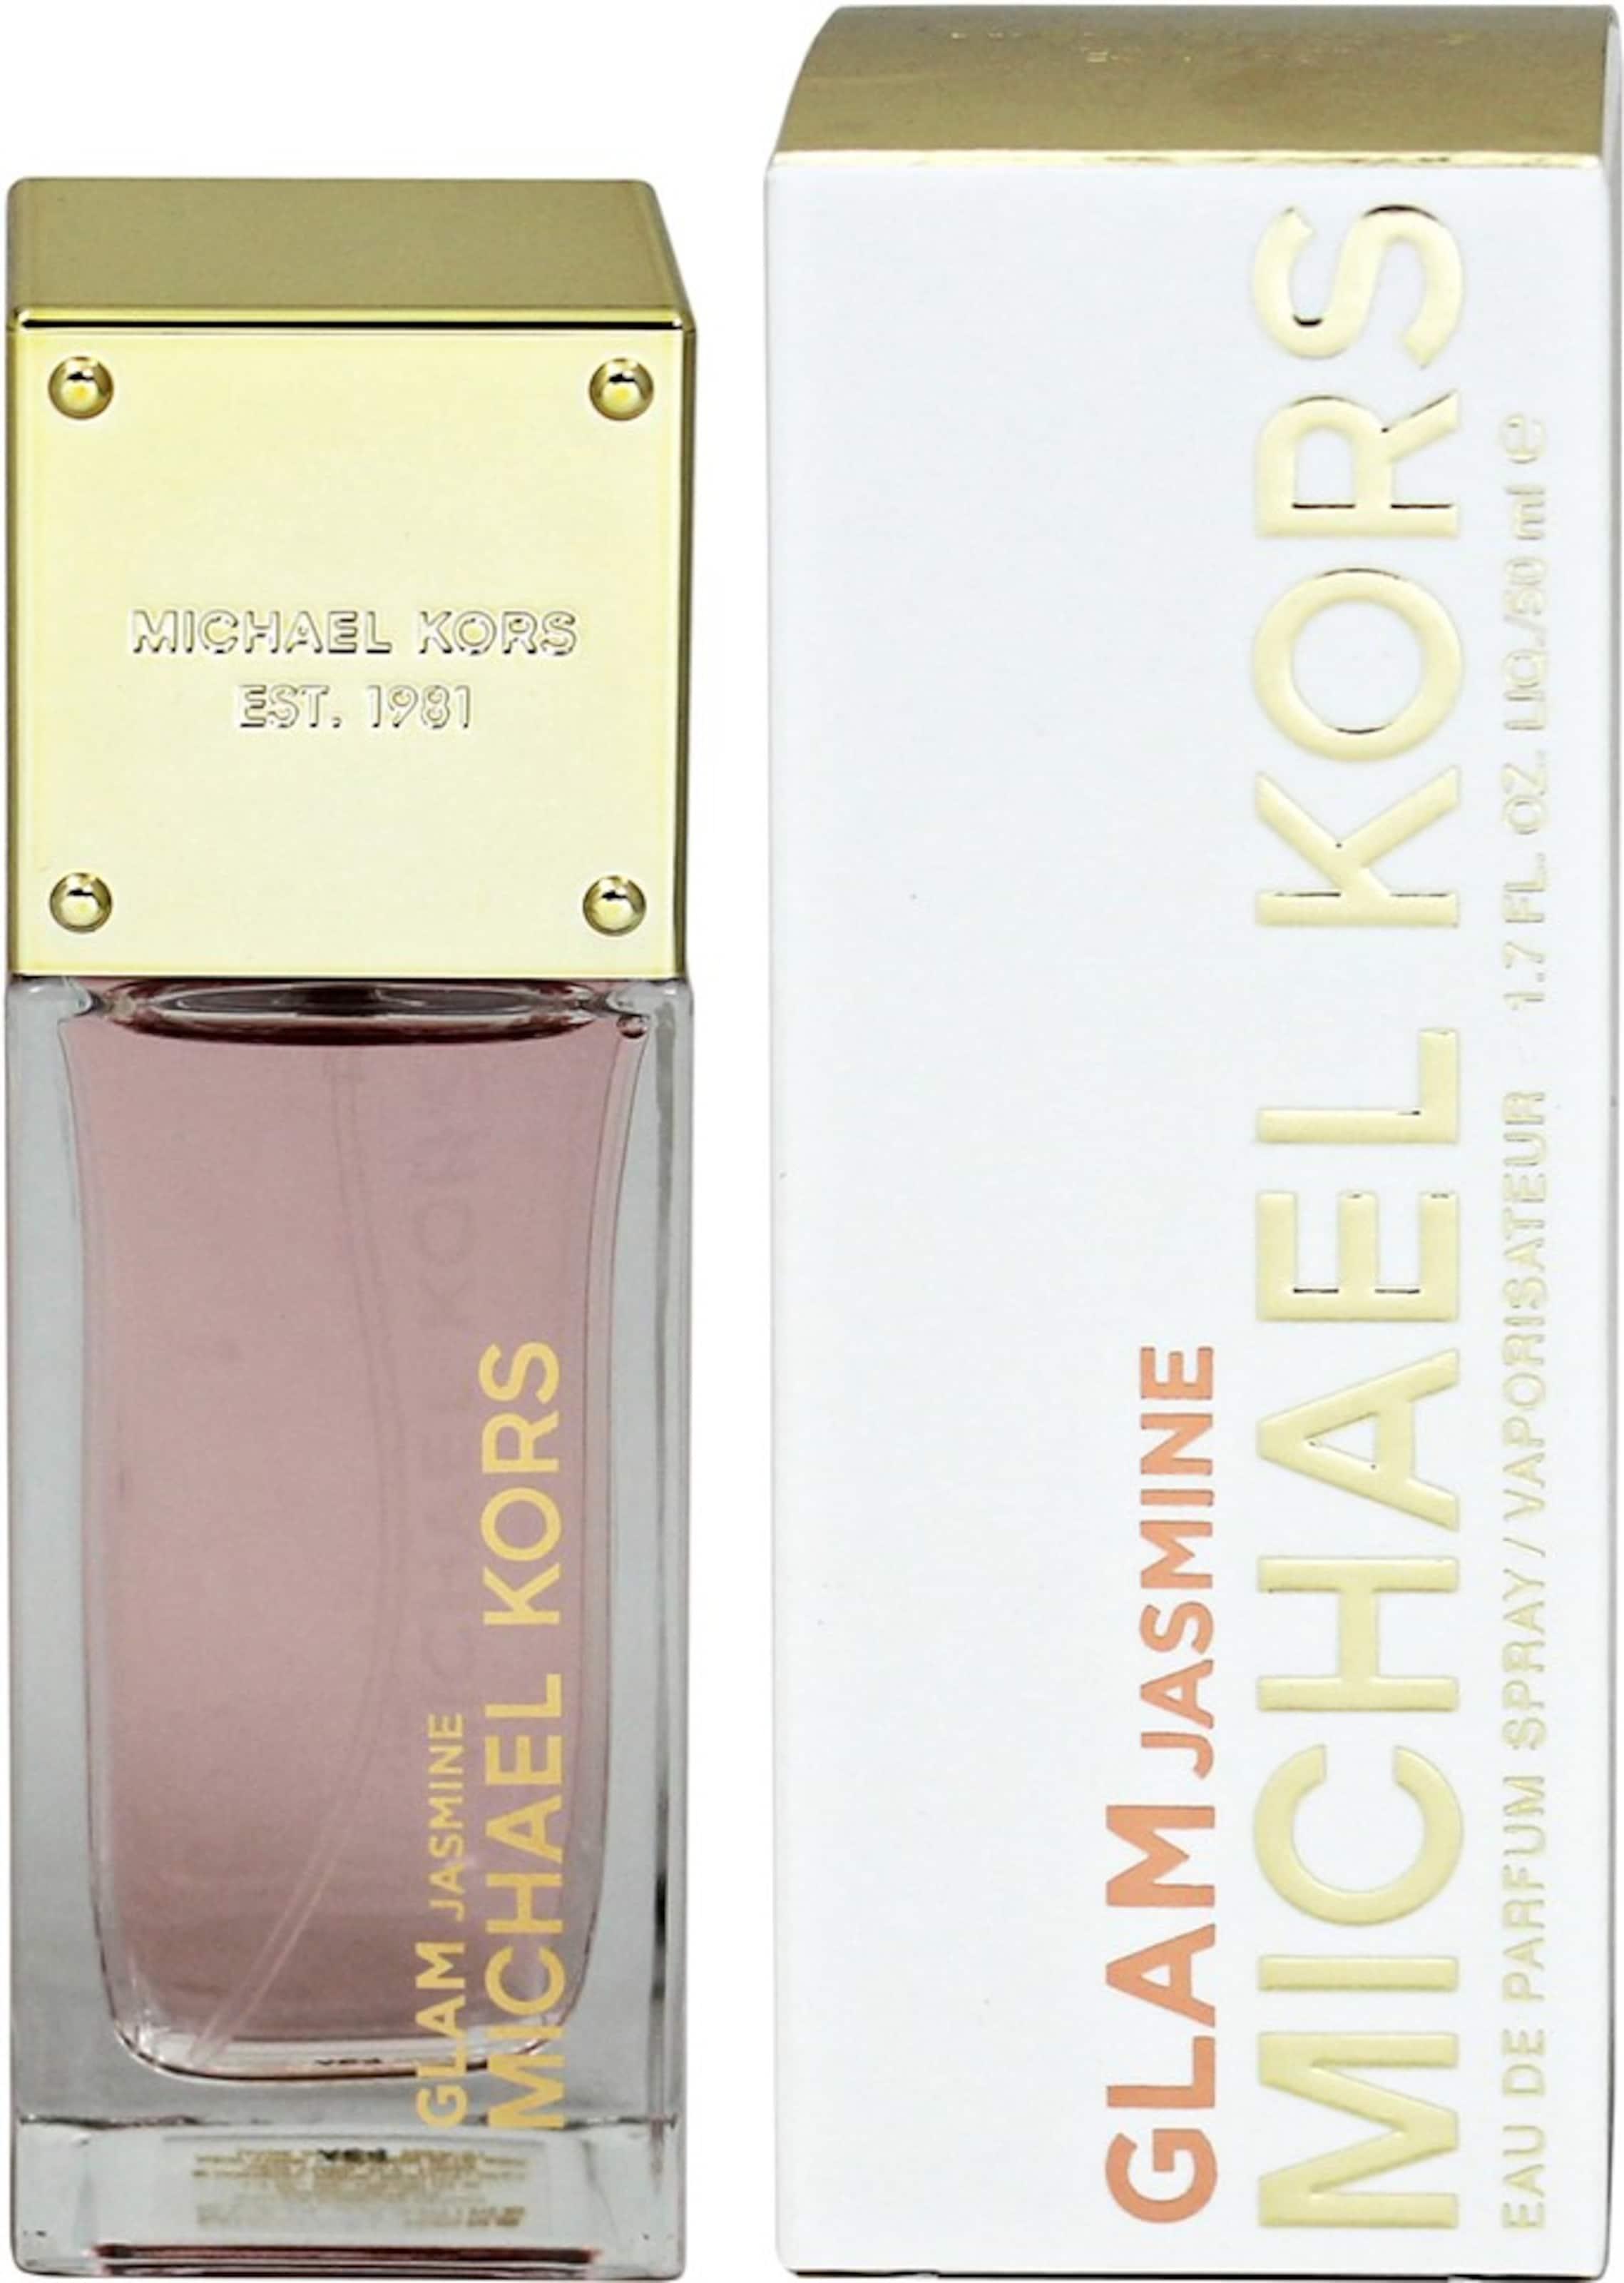 Michael Kors 'Jasmine', Eau de Parfum